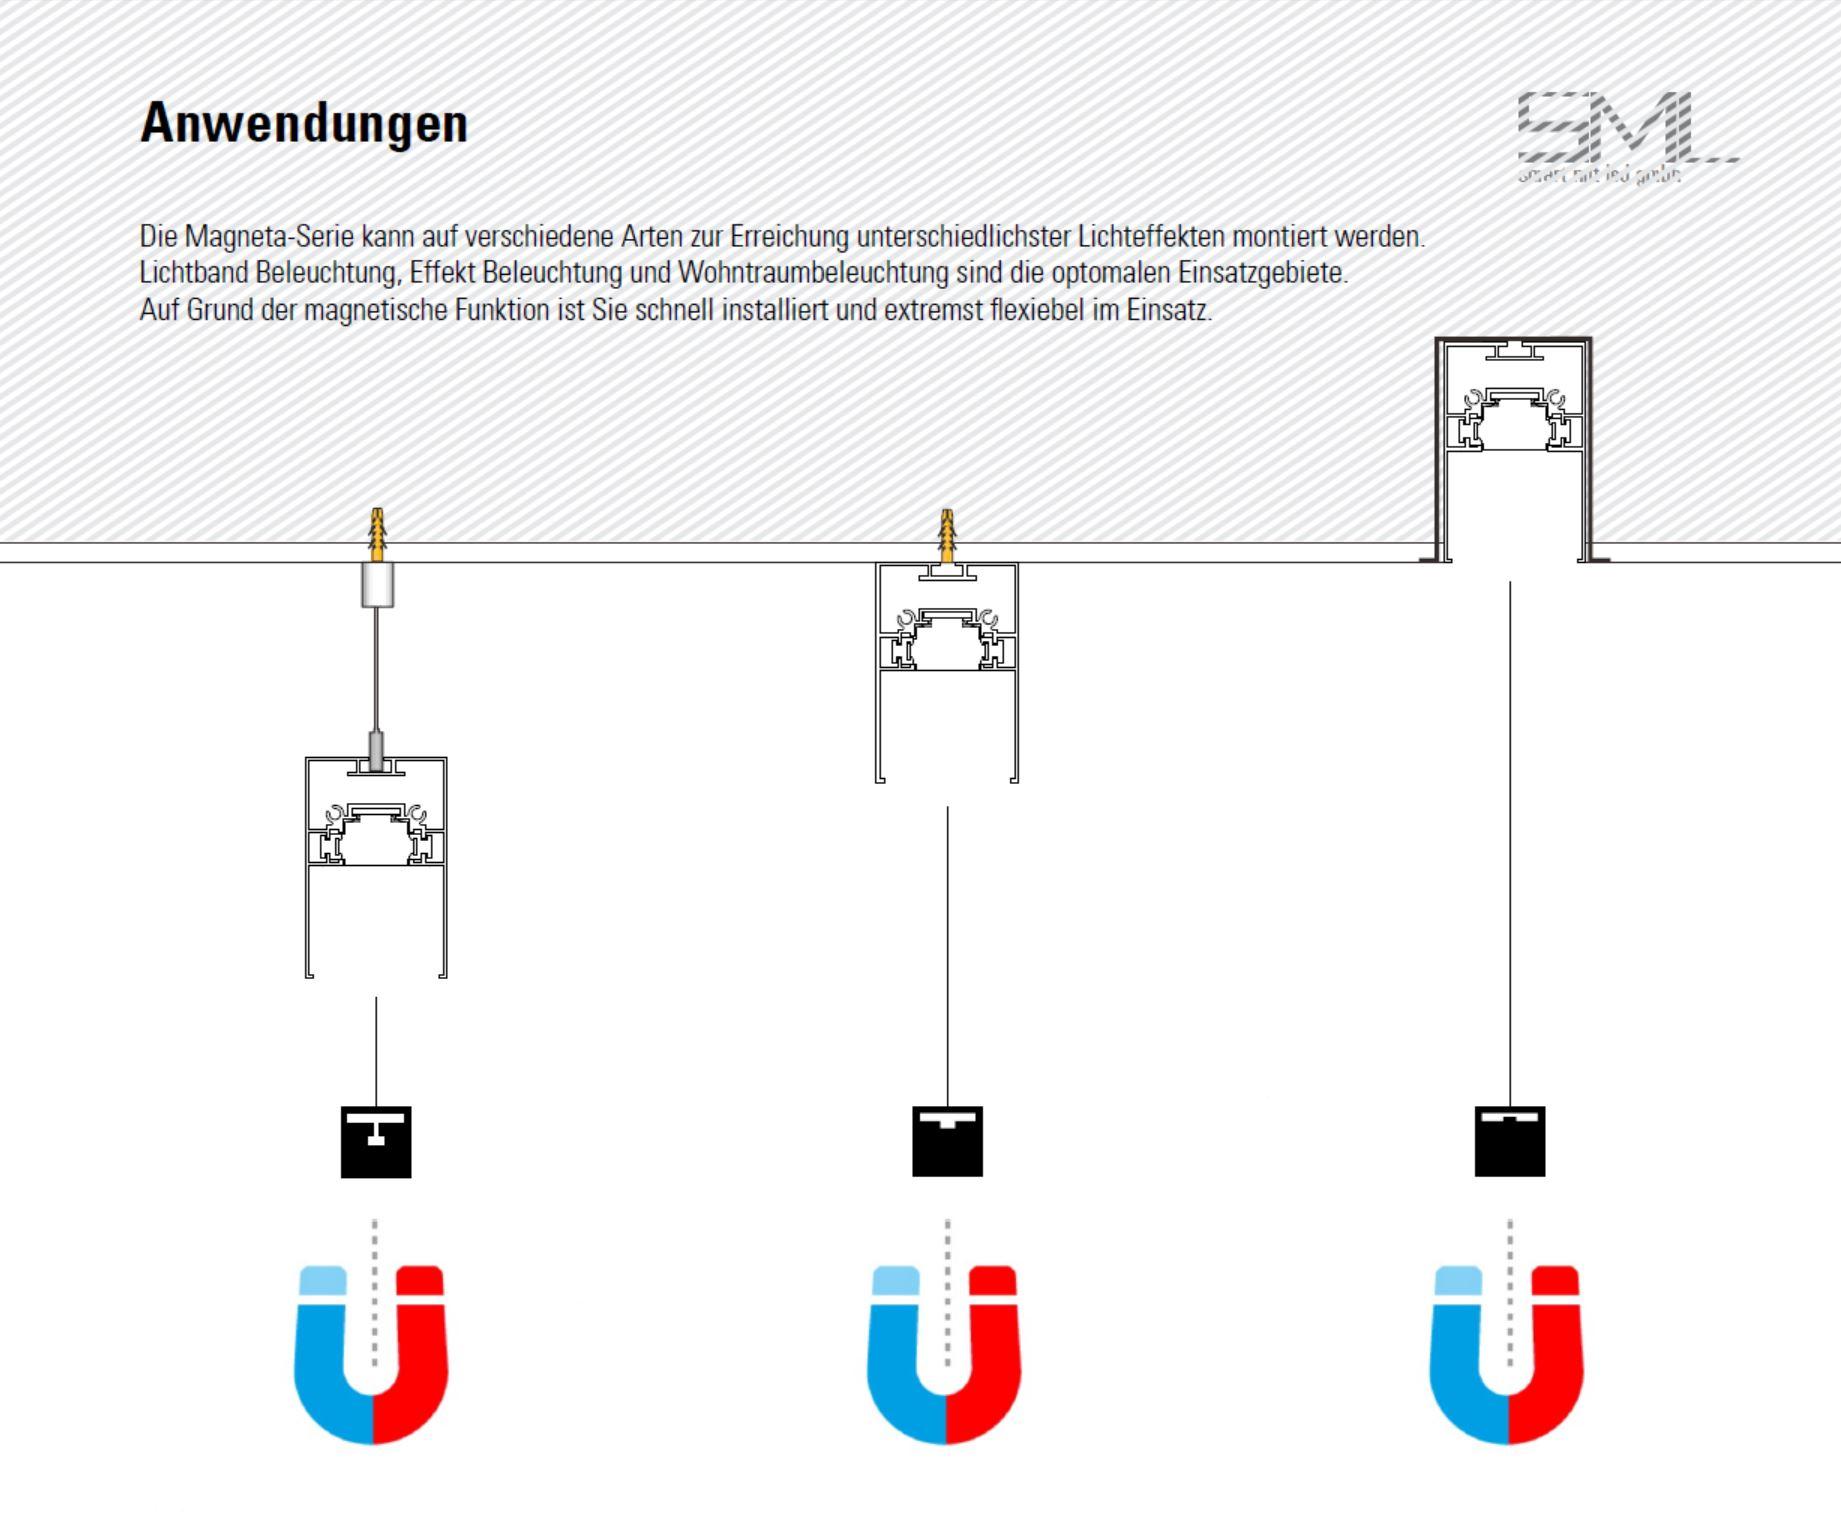 LED Lichtbandsystem Magneta Tragschiene